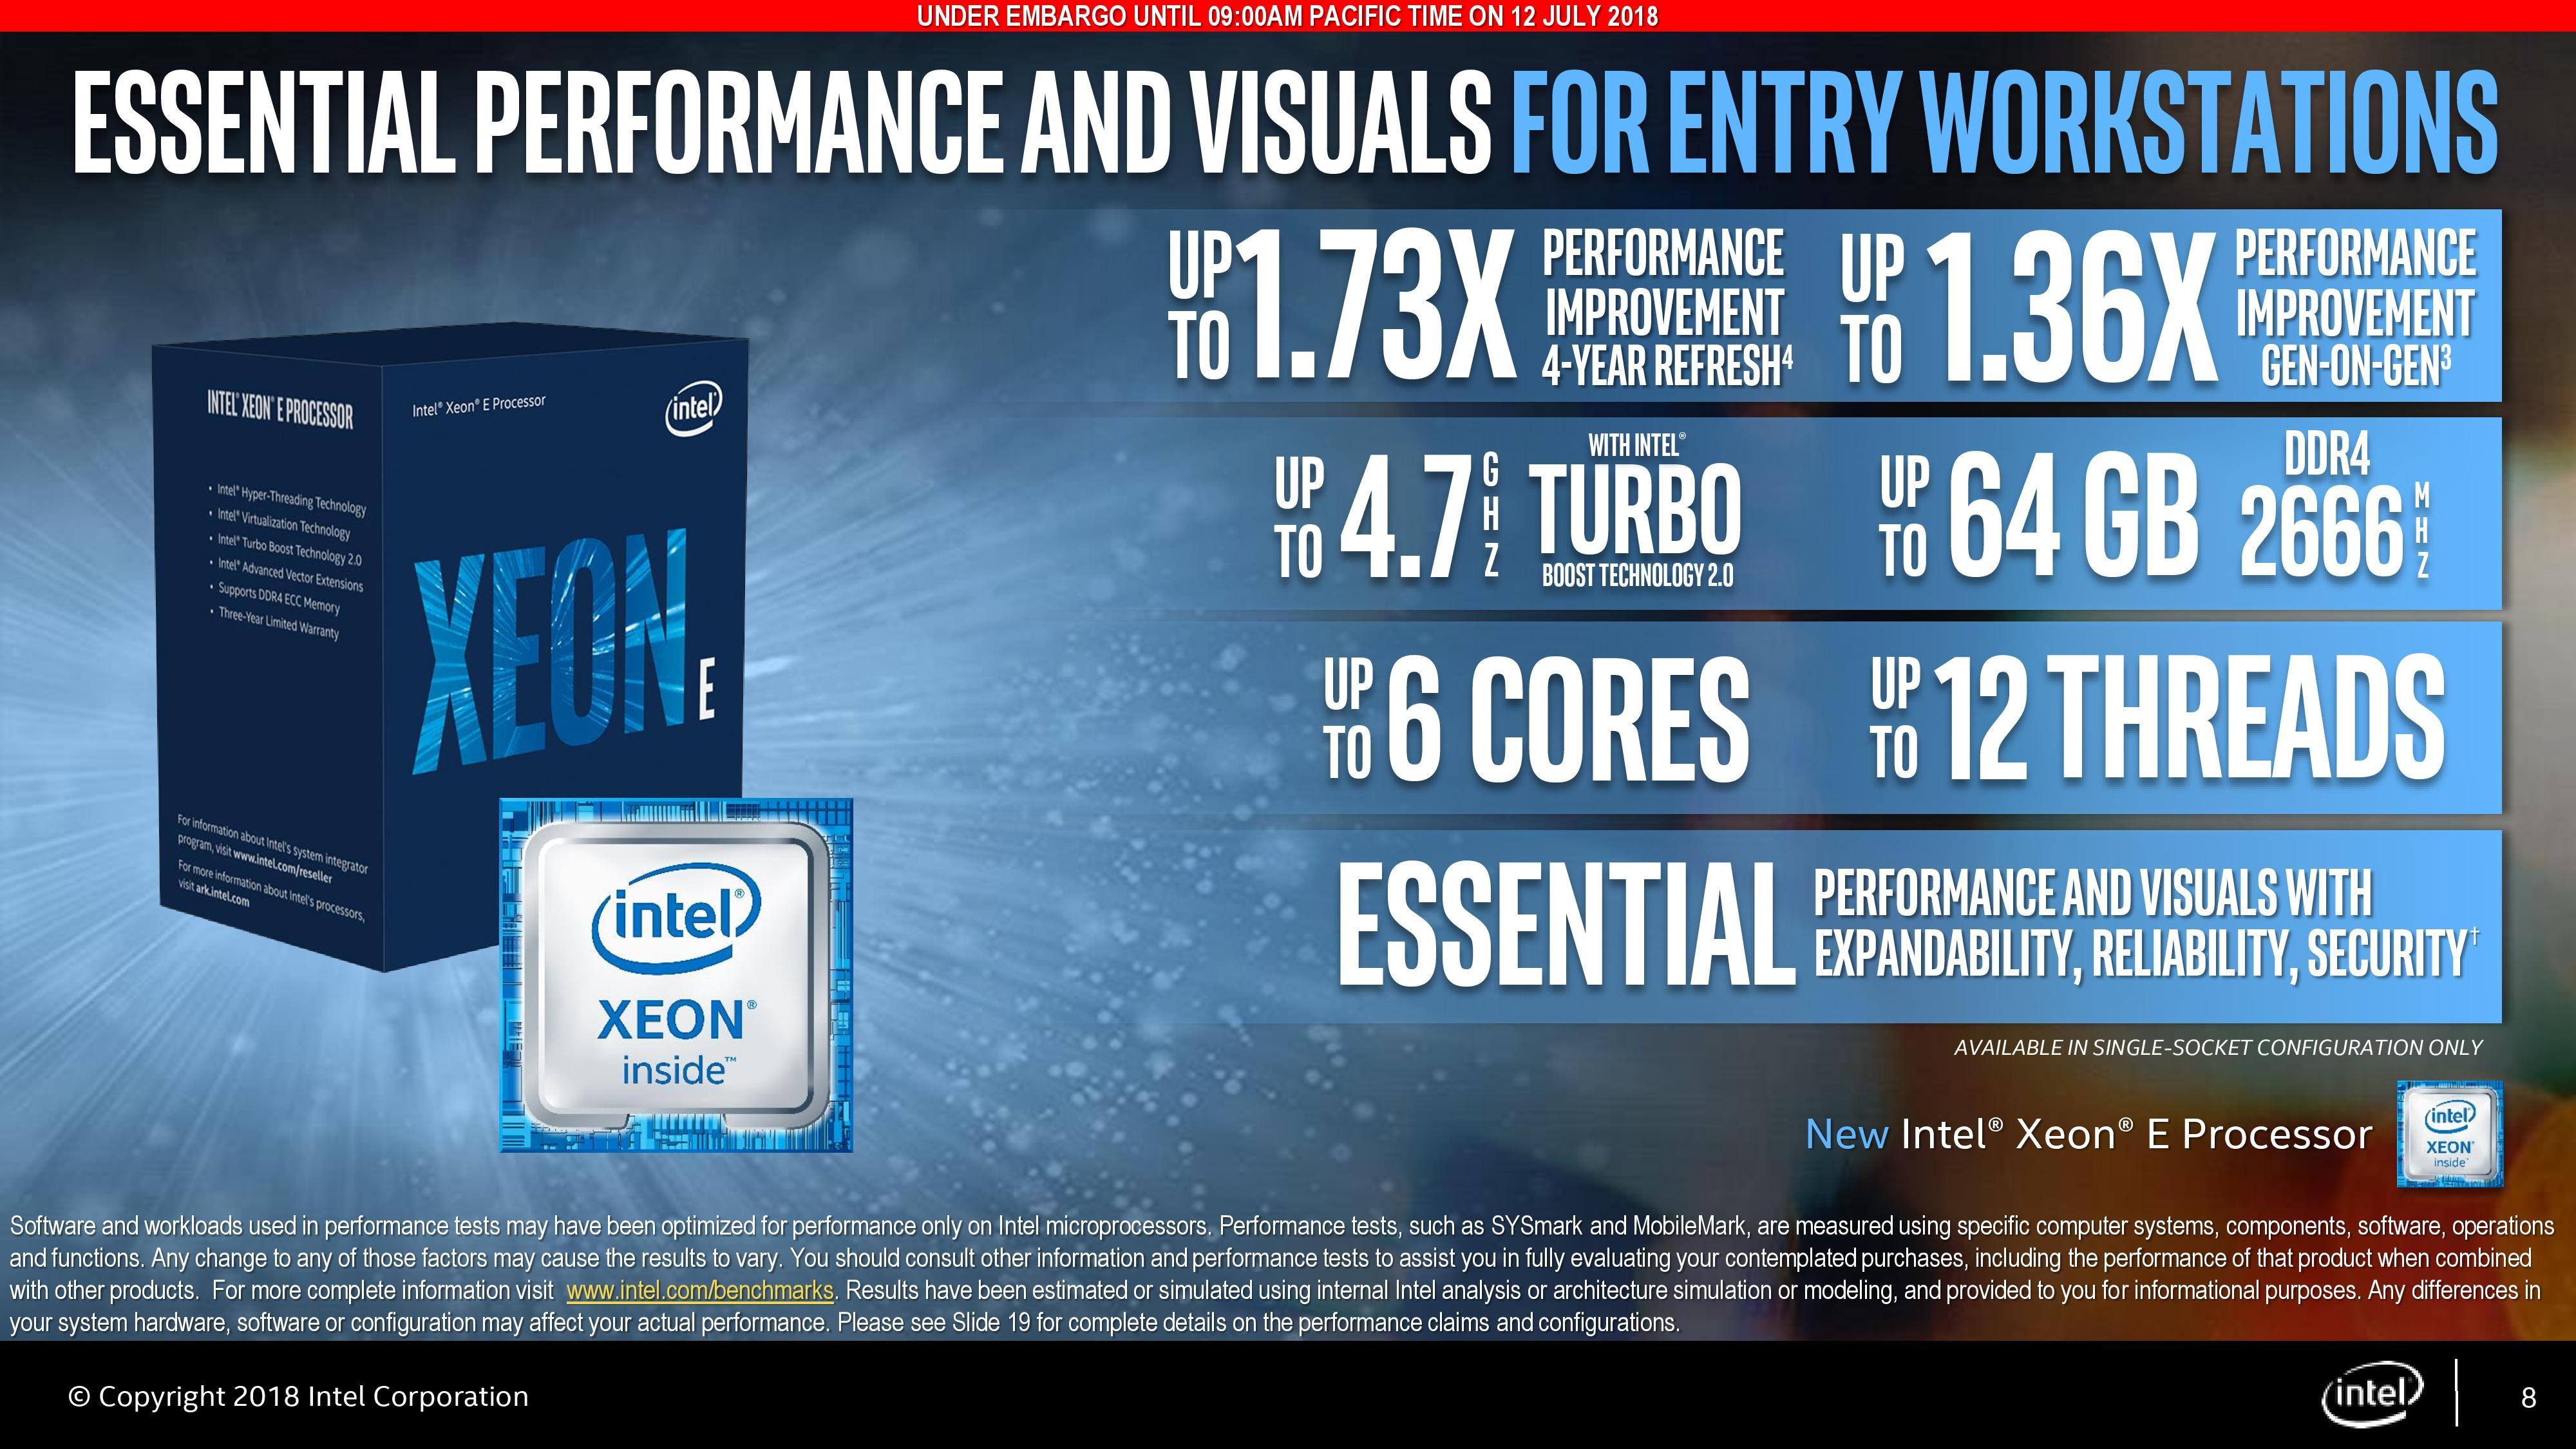 Intel Launches Coffee Lake Xeon E (Entry): The Next-Gen E3-1200